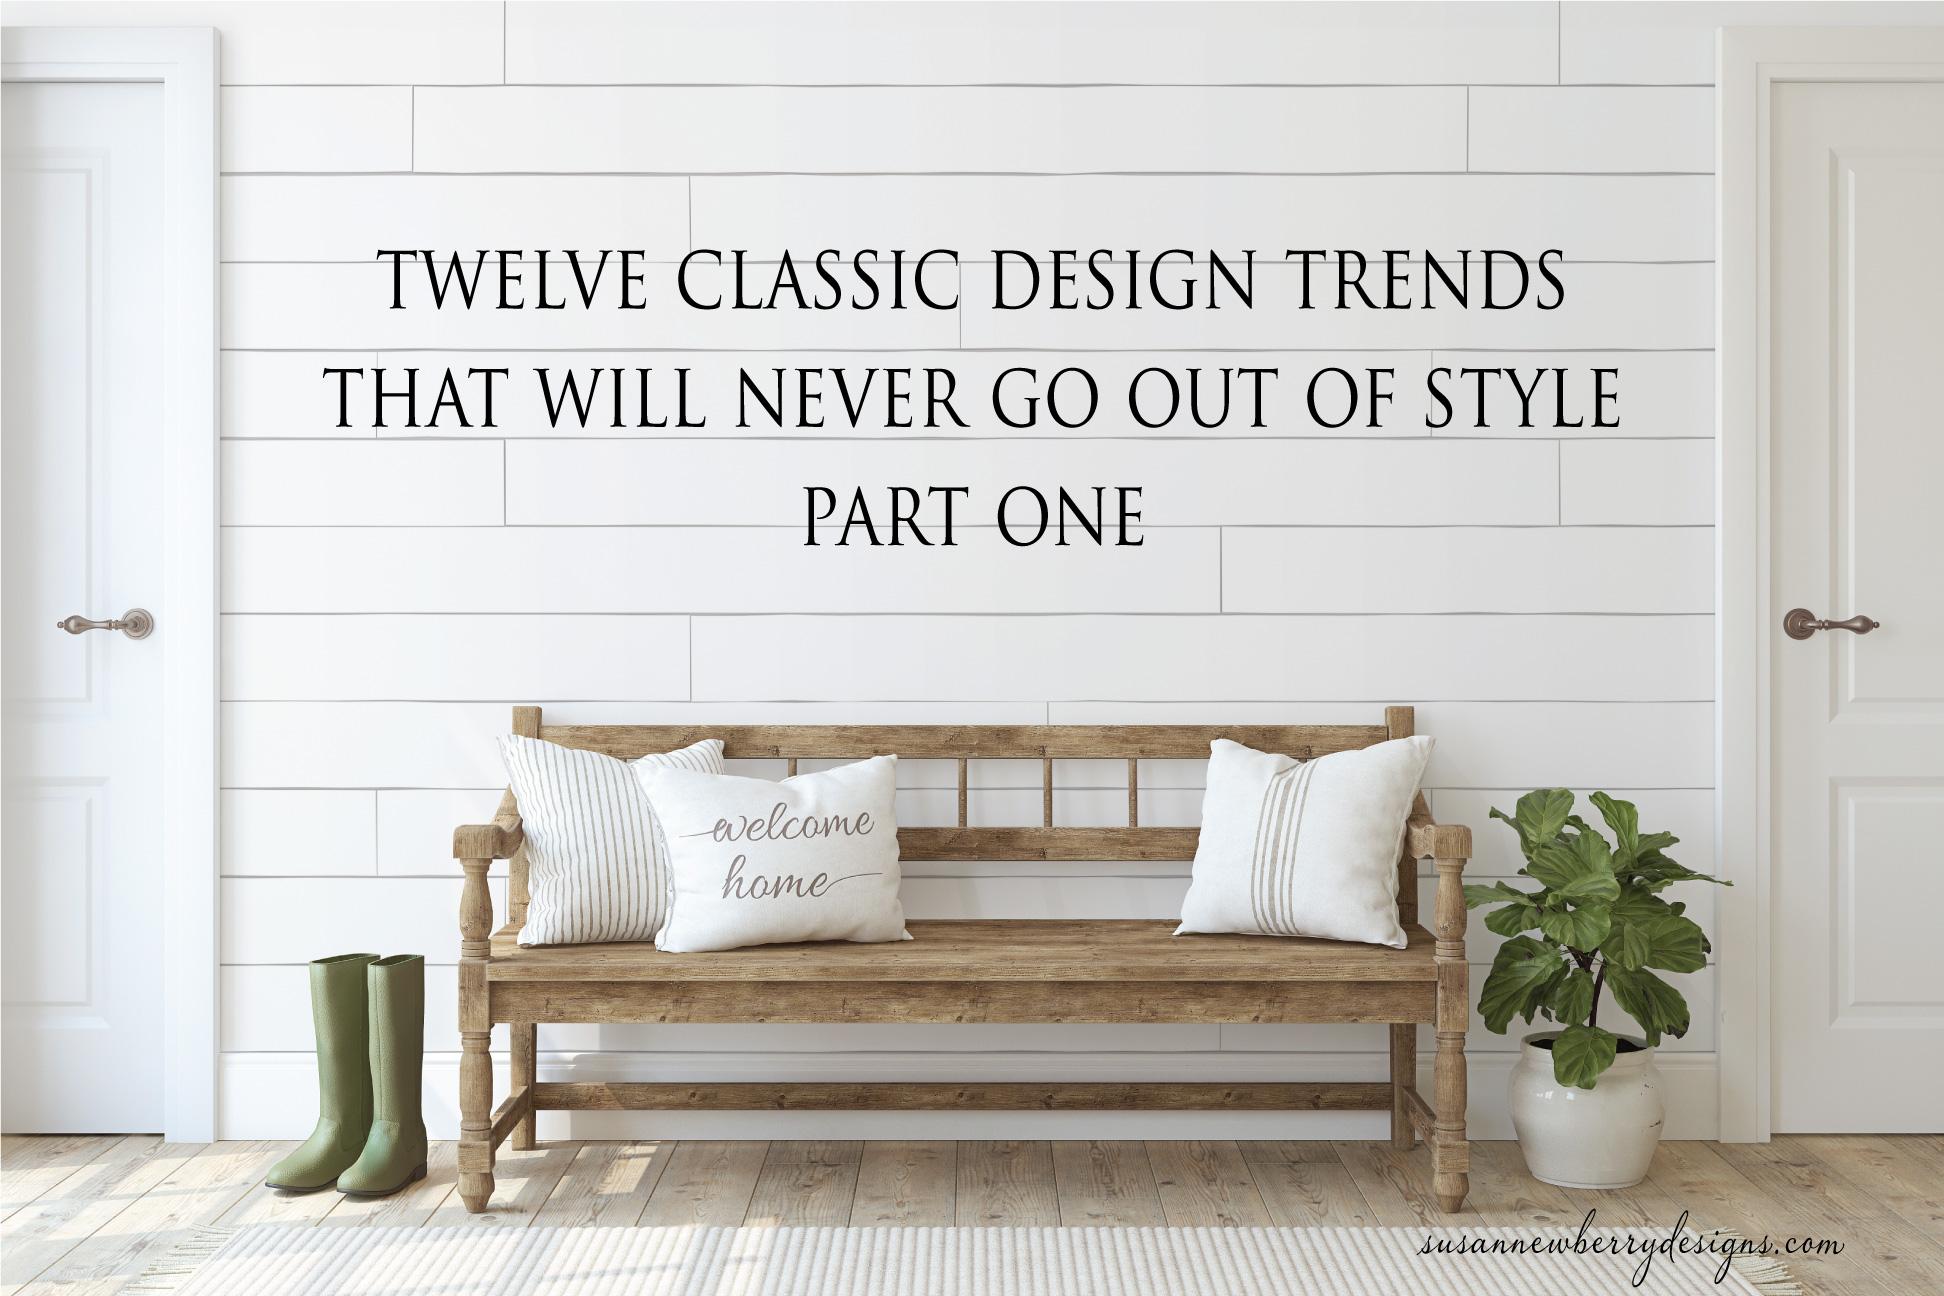 Design-Trends-Part-1.jpg